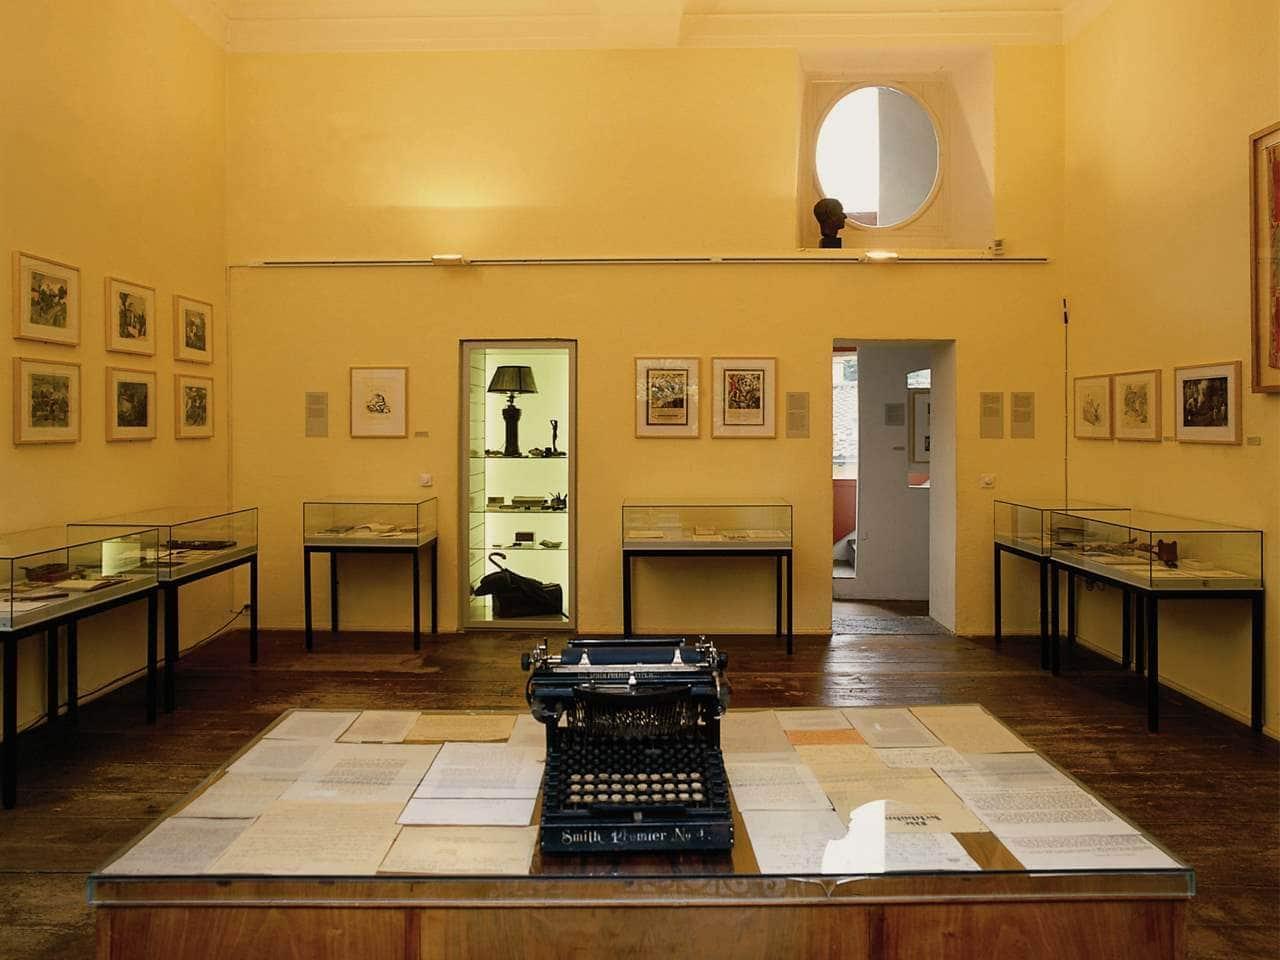 Ausflug: Museum Hermann Hesse – Stationen des Nobelpreisträgers